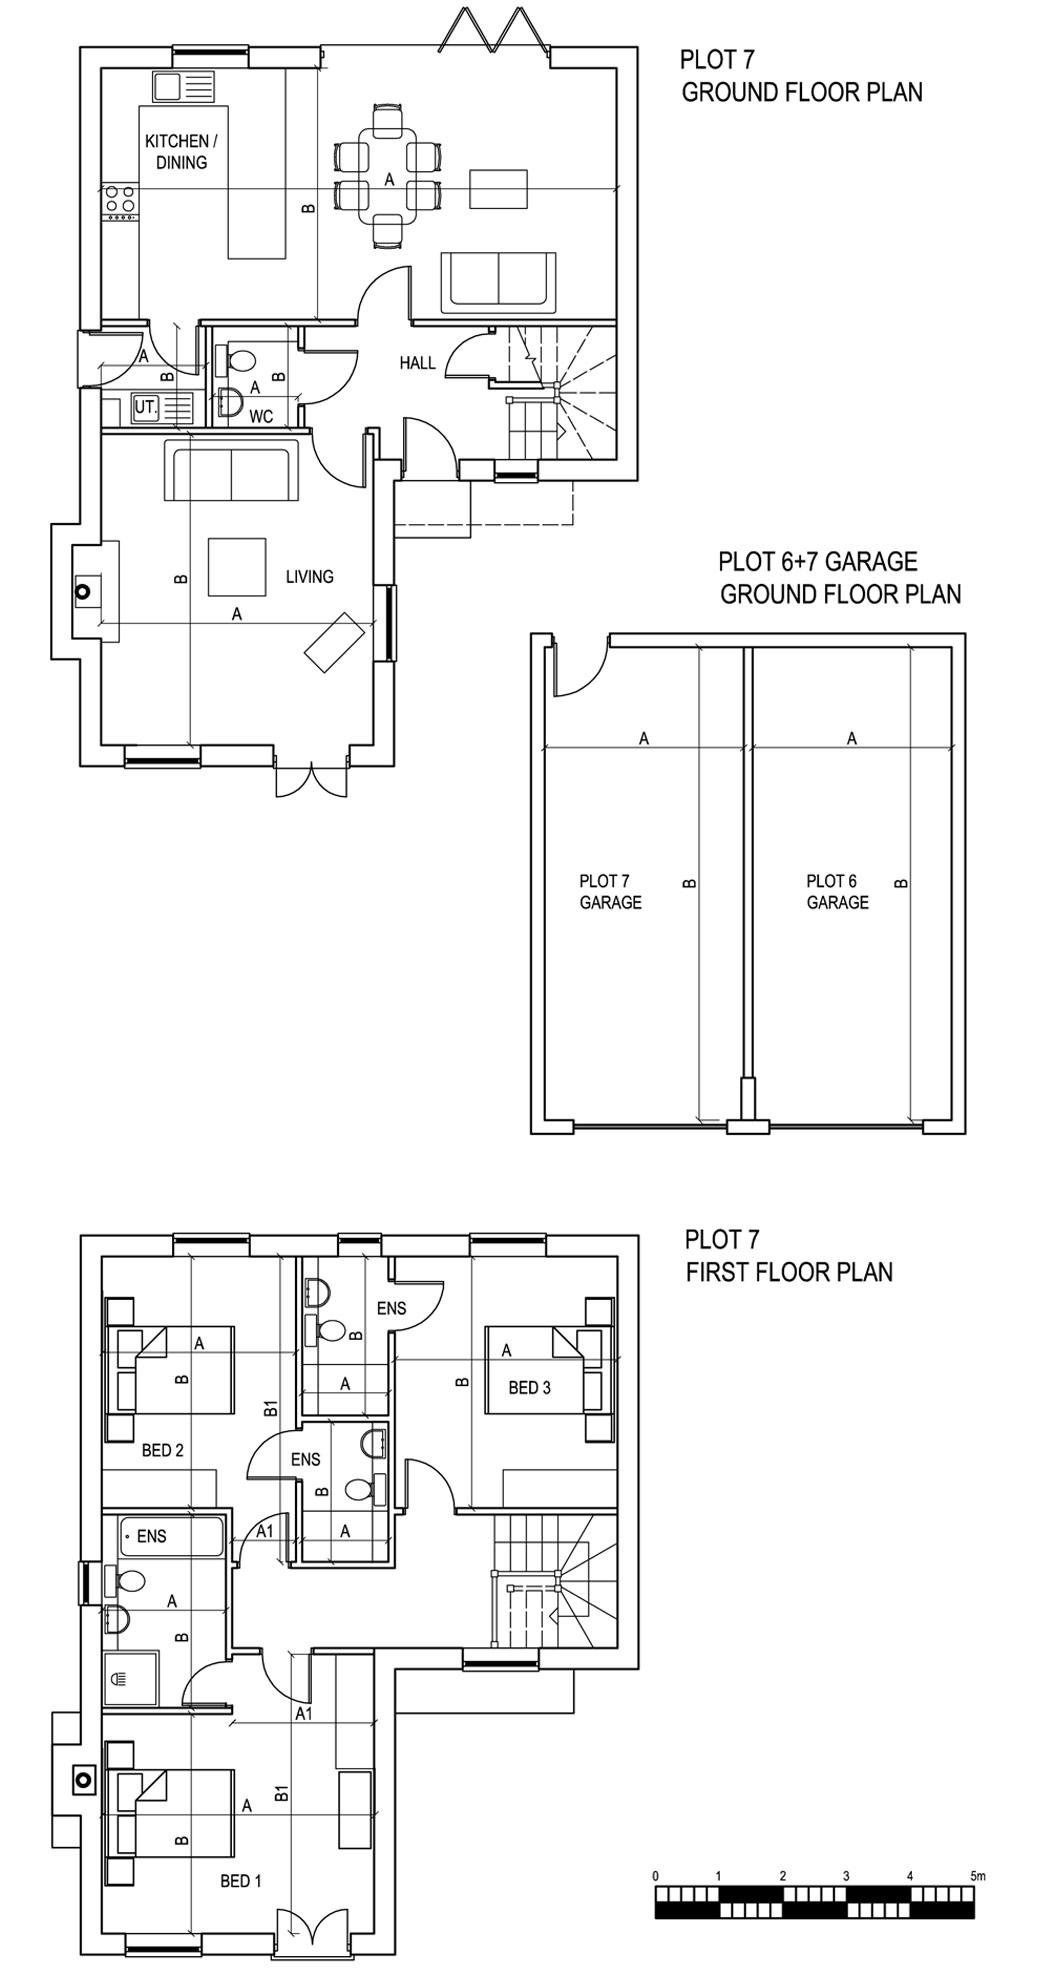 floorplans-OLD-SMITHY-house-